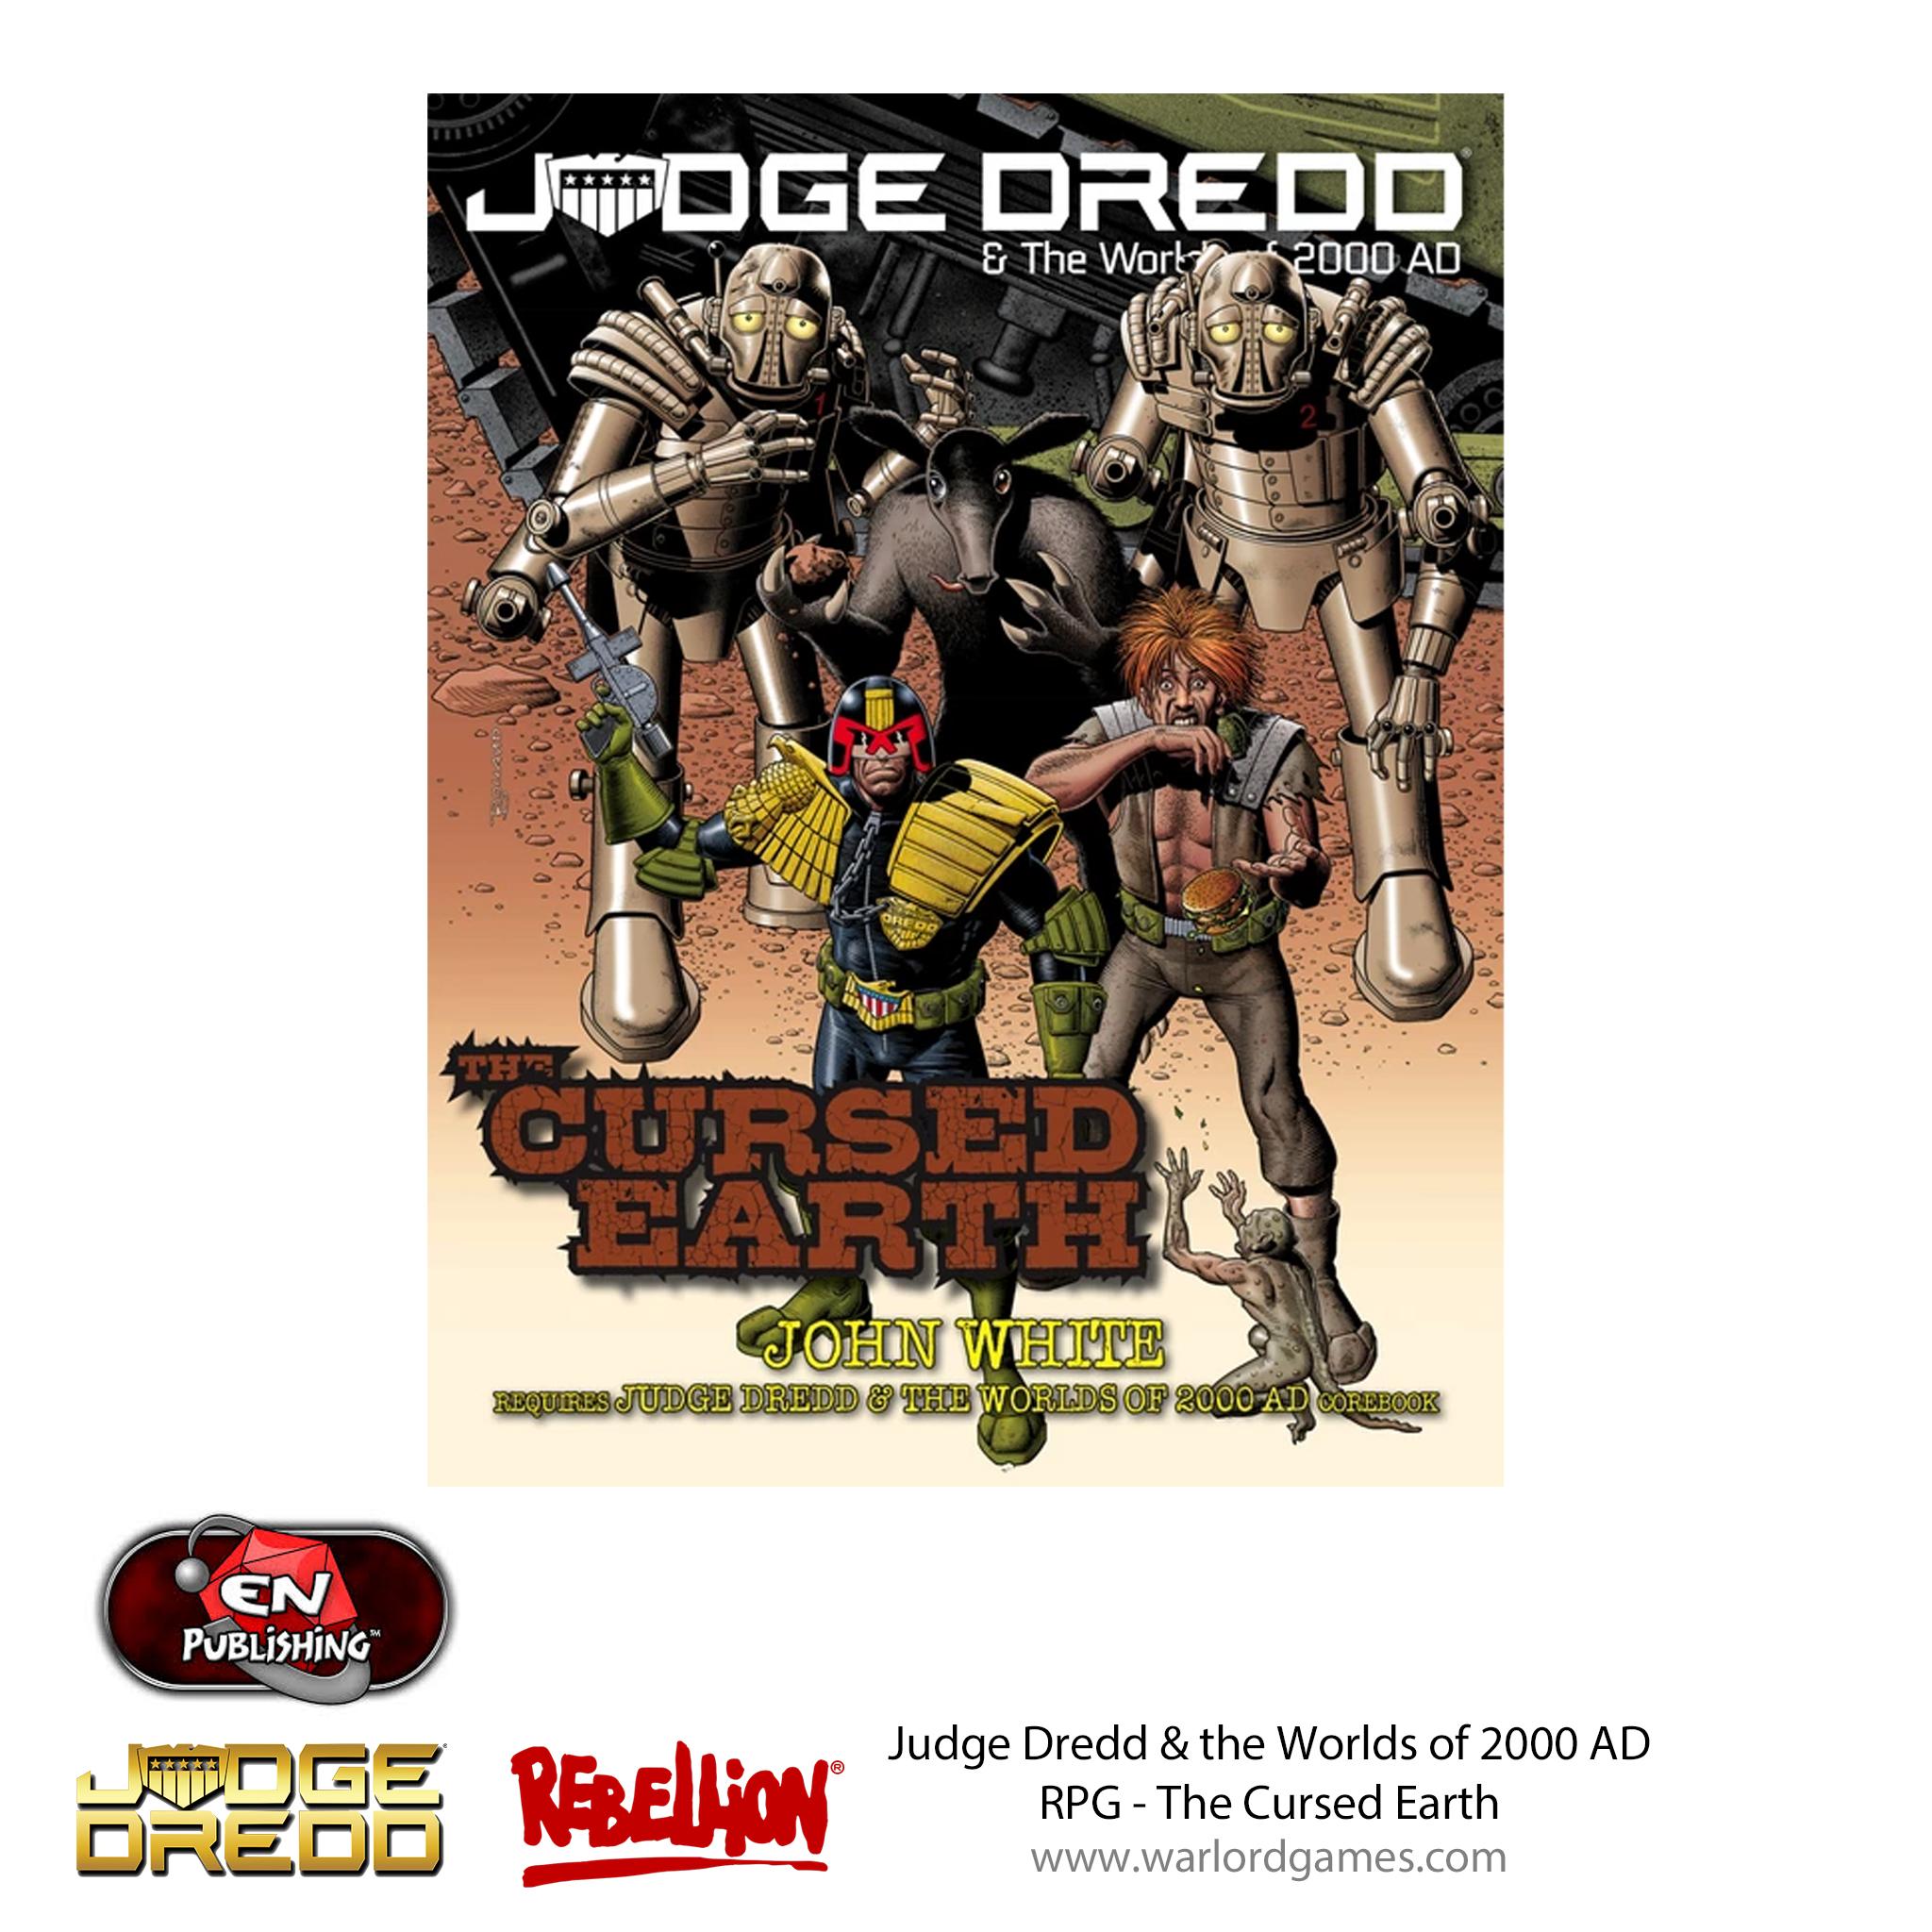 Judge Dredd RPG - Cursed Earth